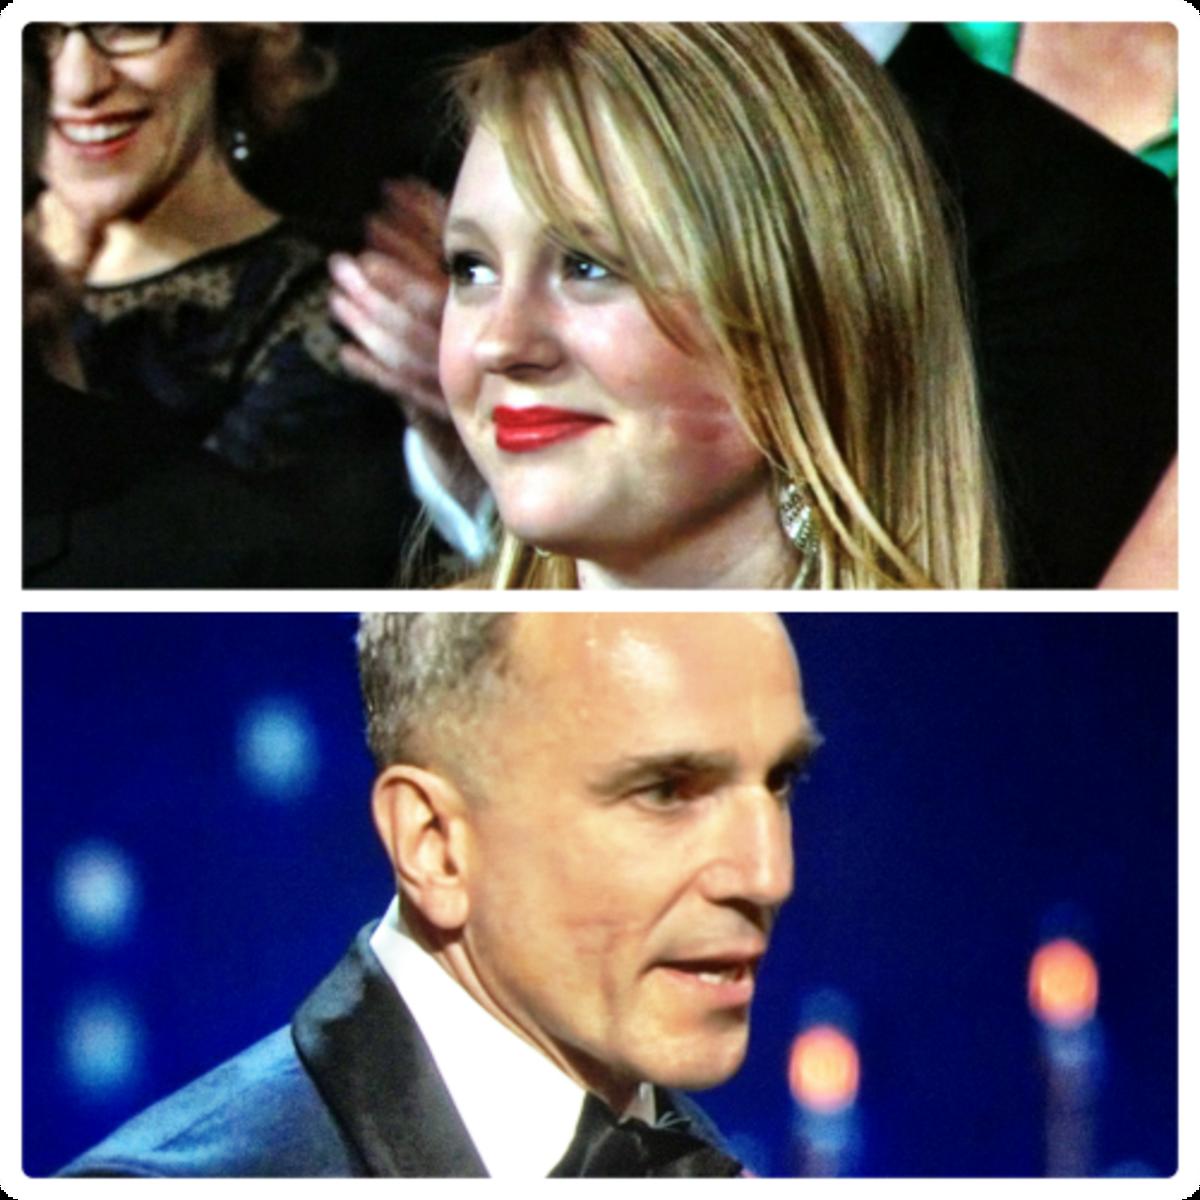 Daniel Day Lewis Lipstick Face Oscars